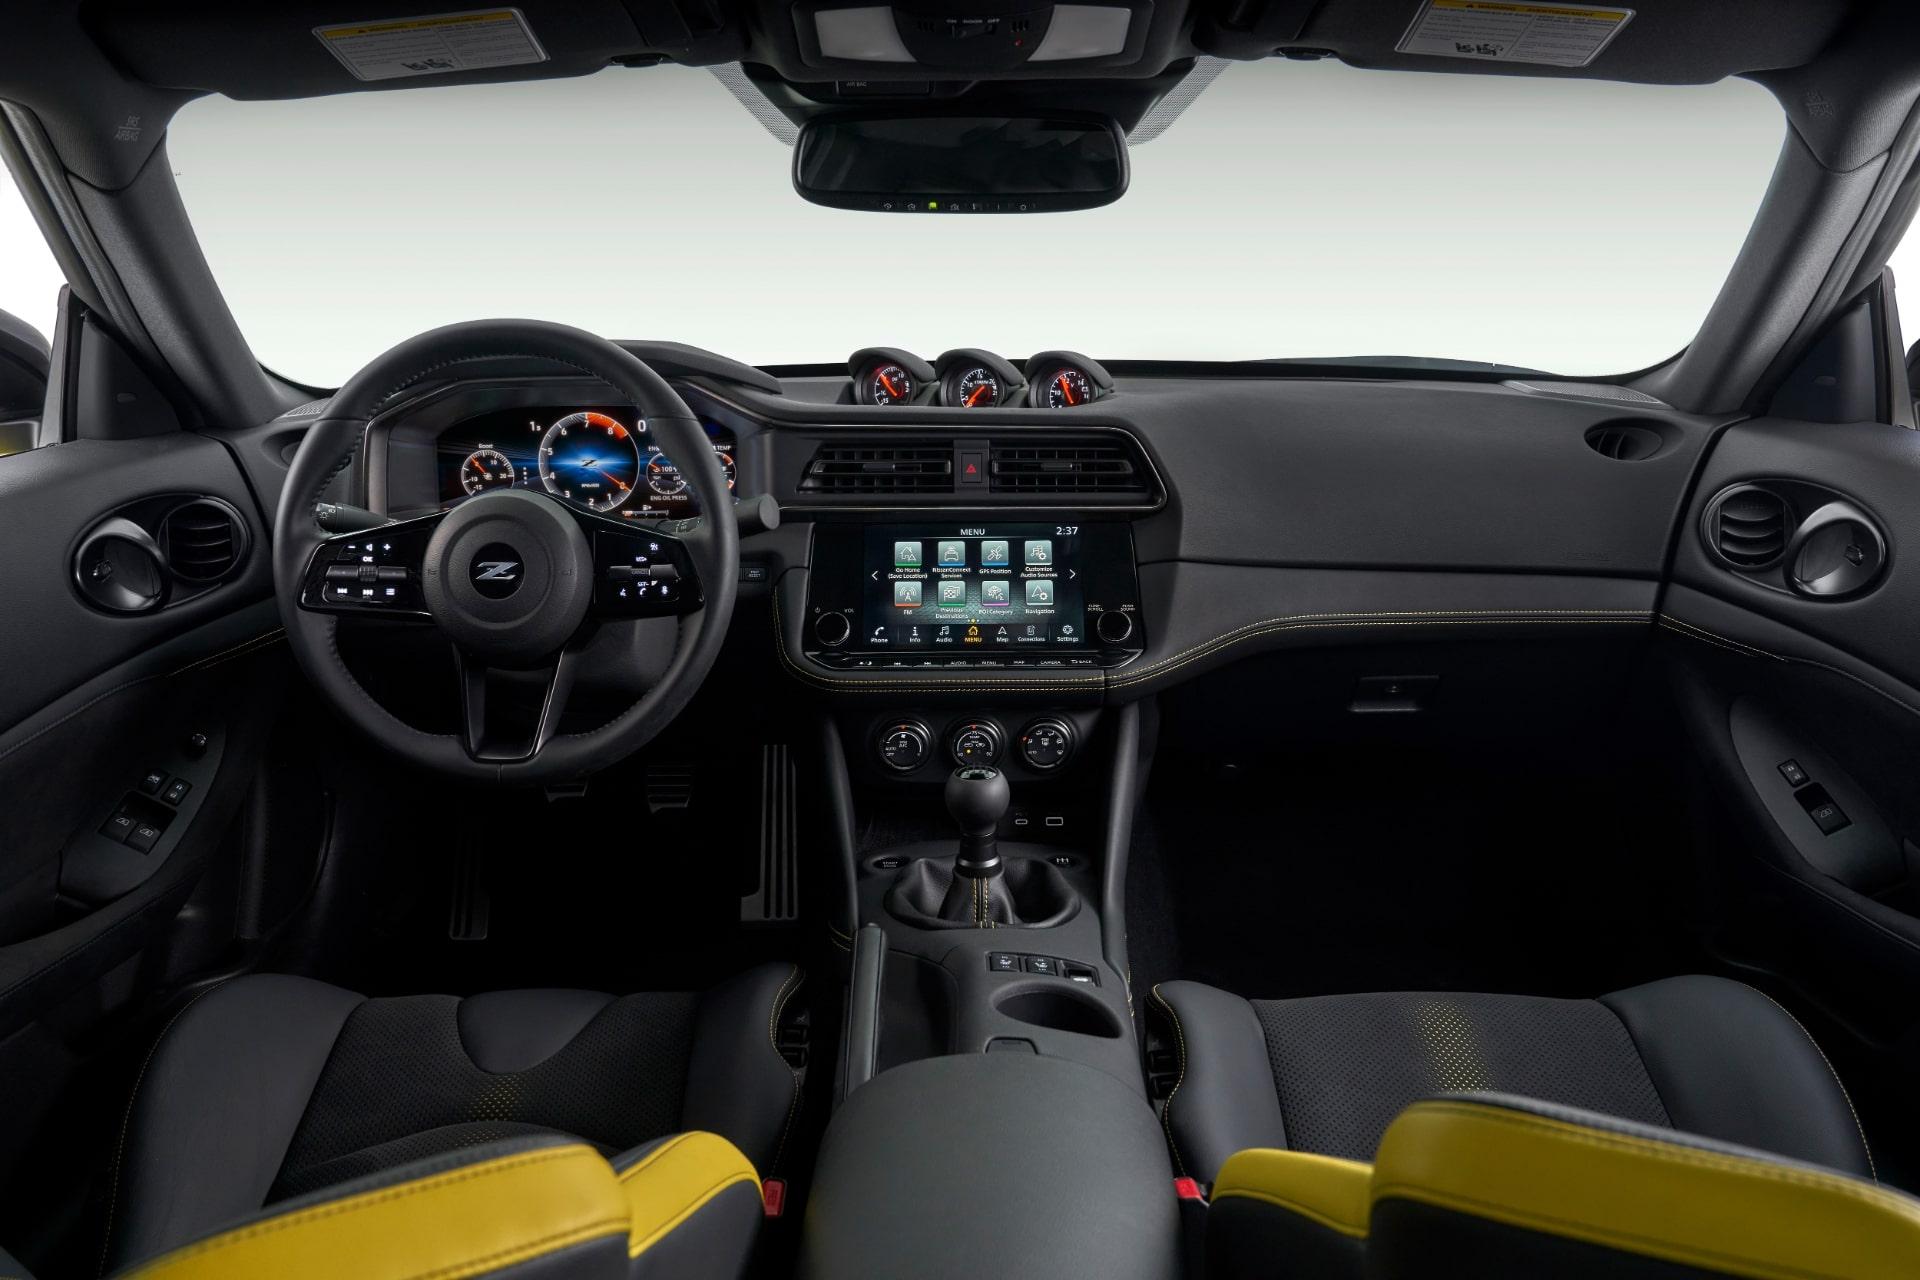 日産「Z」 インテリア(米国市場)特別限定仕様車「Proto Spec」